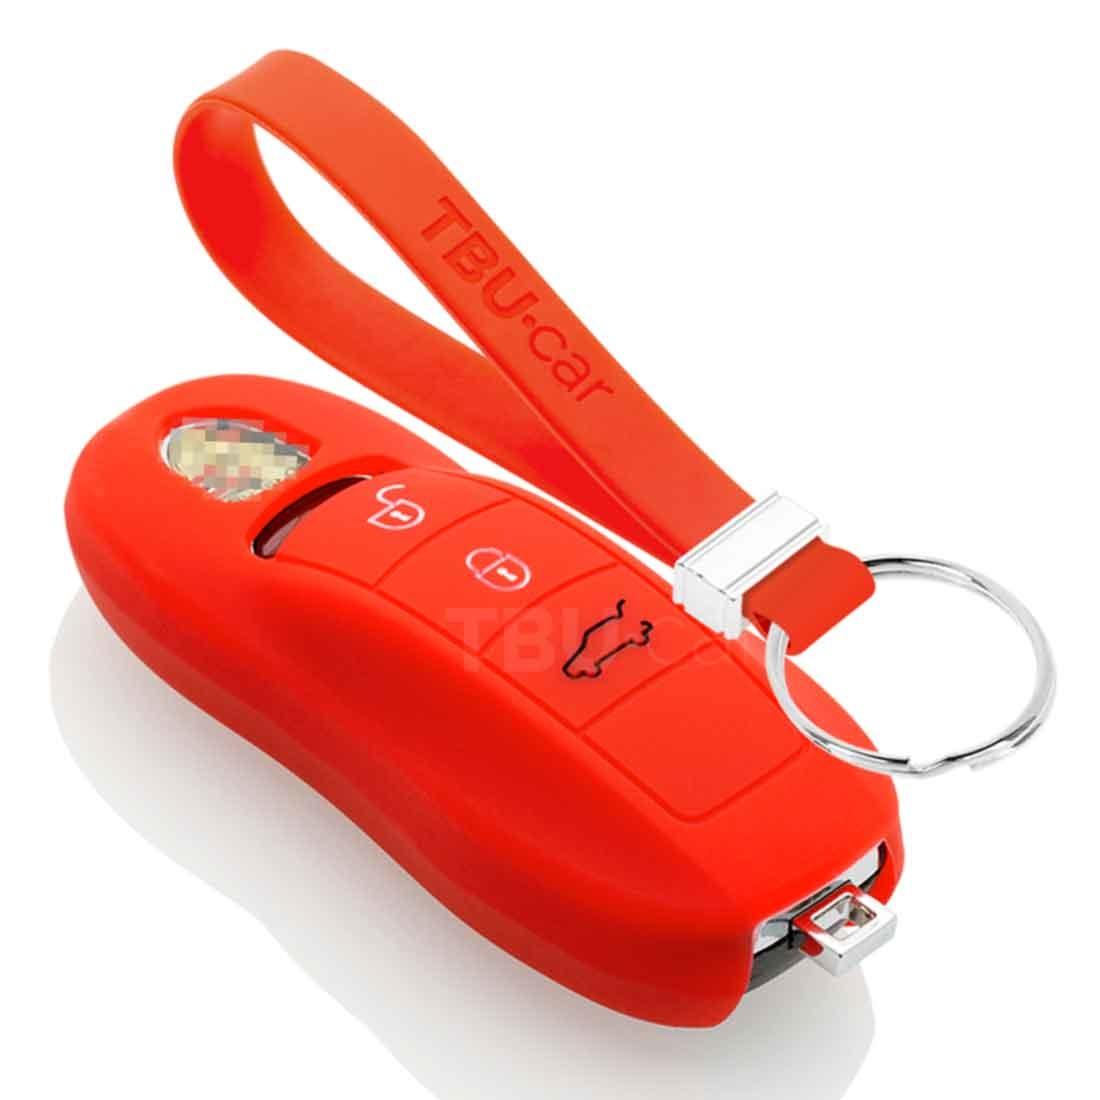 TBU car TBU car Sleutel cover compatibel met Porsche - Silicone sleutelhoesje - beschermhoesje autosleutel - Rood